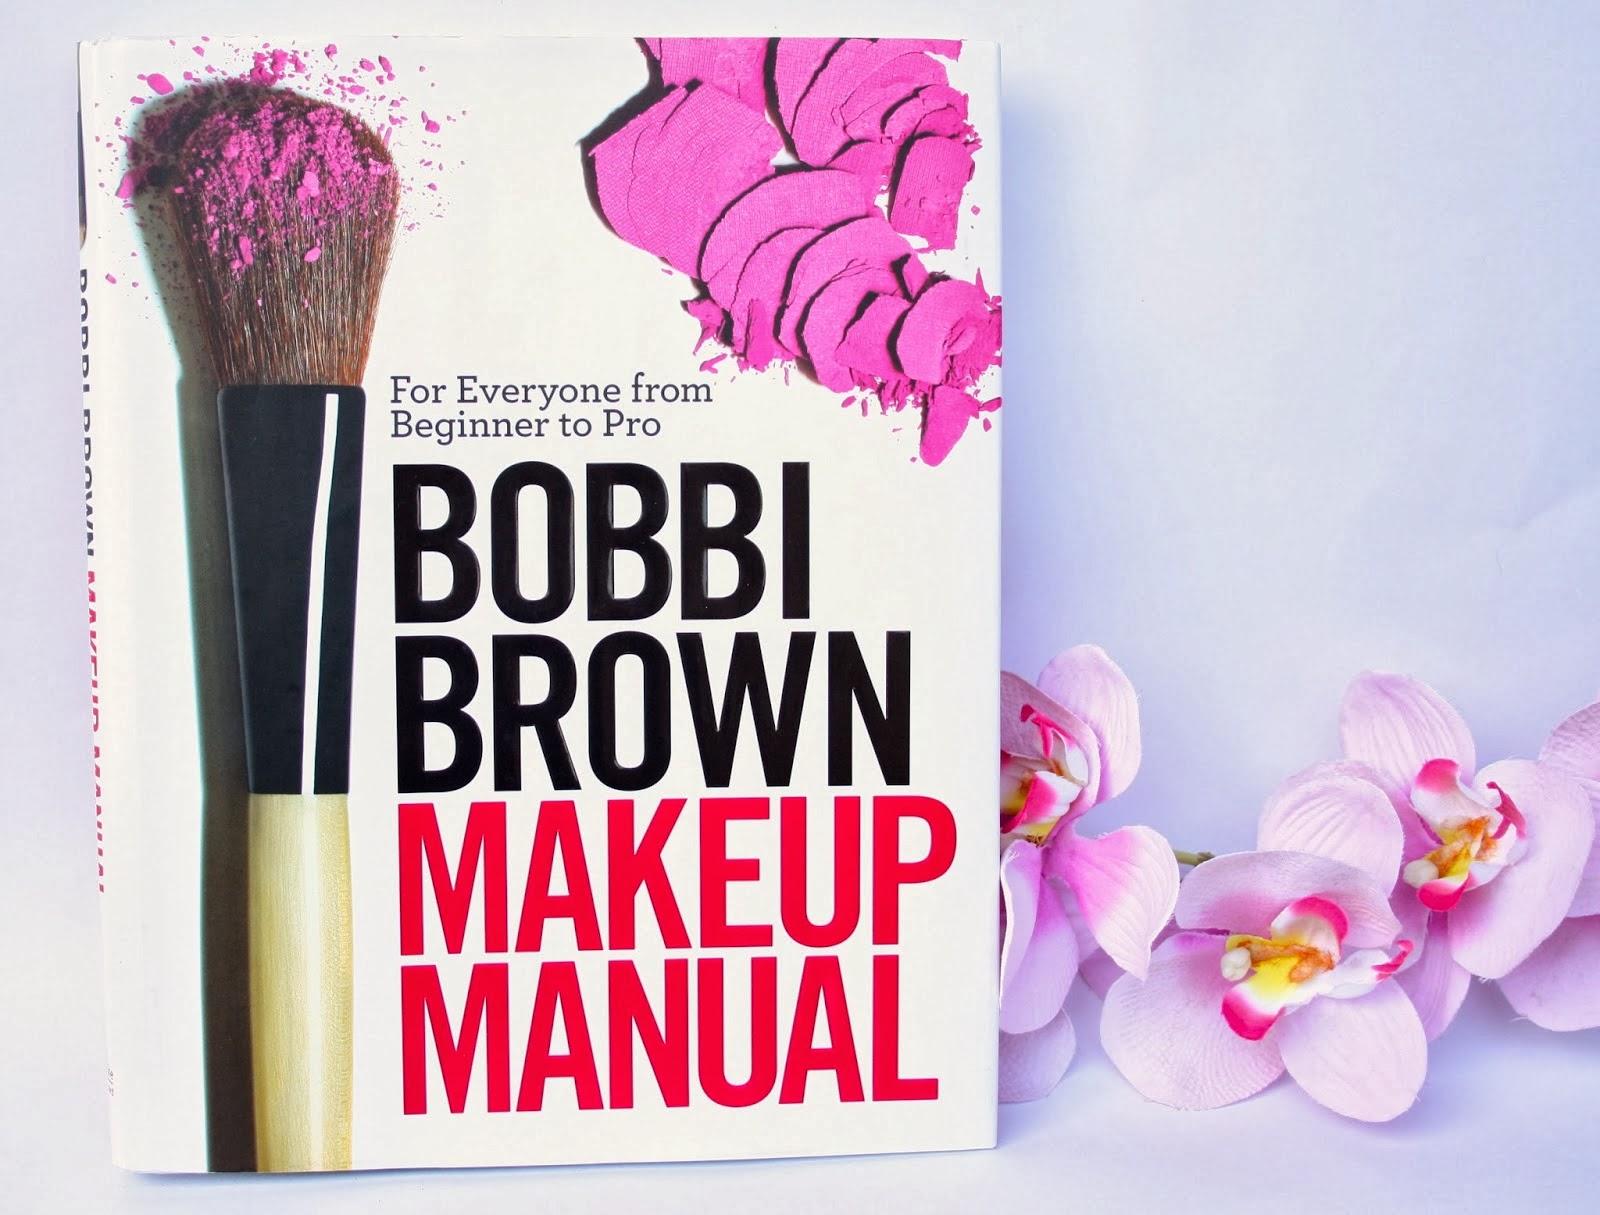 Бобби браун книга макияж для глаз с